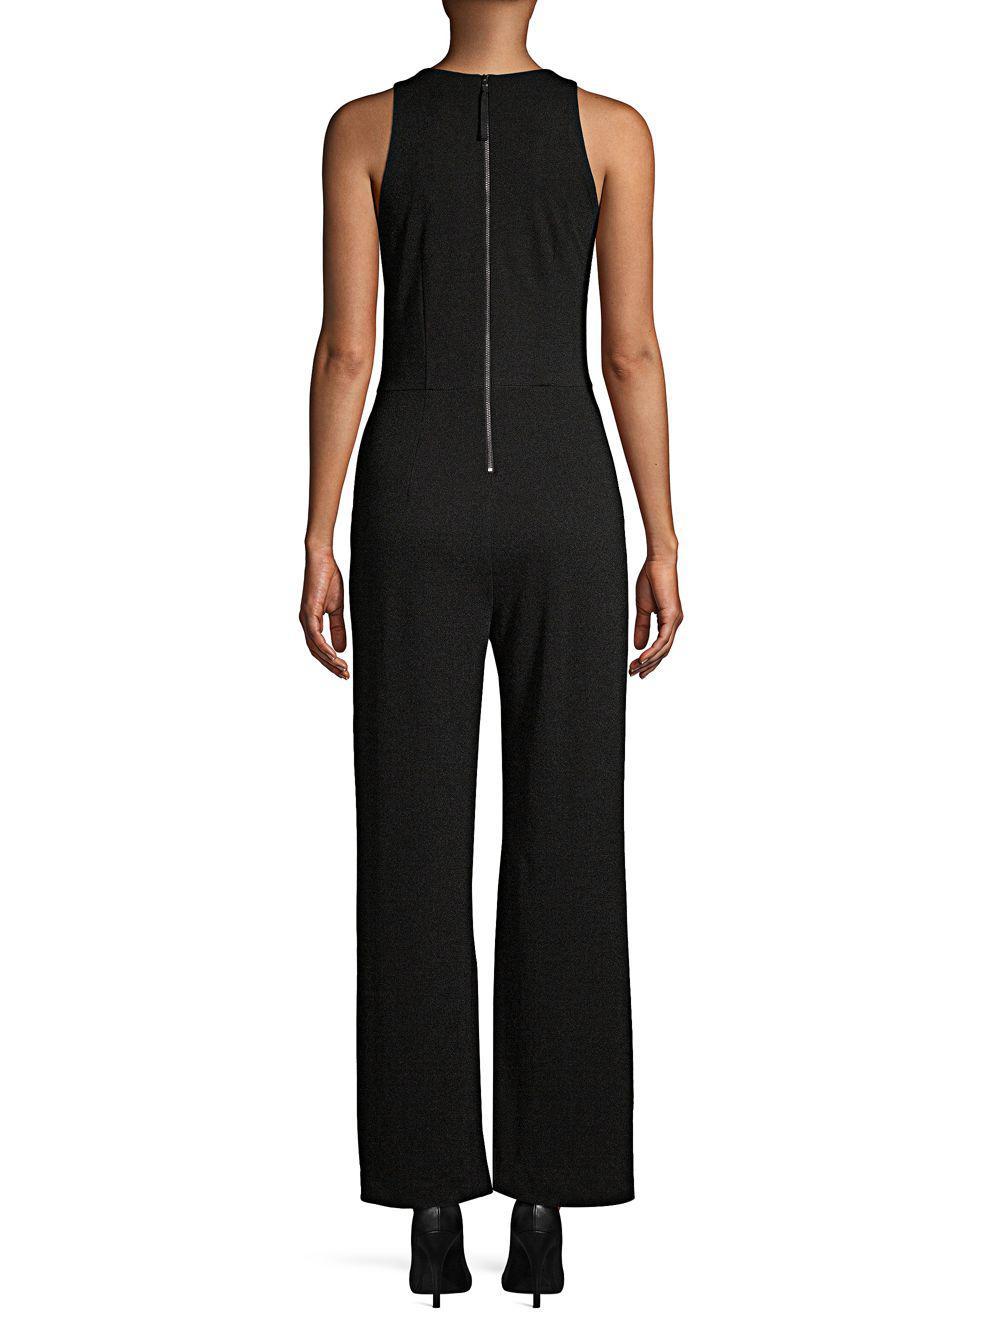 67bab05dff ... Black Ruched V-neck Jumpsuit - Lyst. View fullscreen